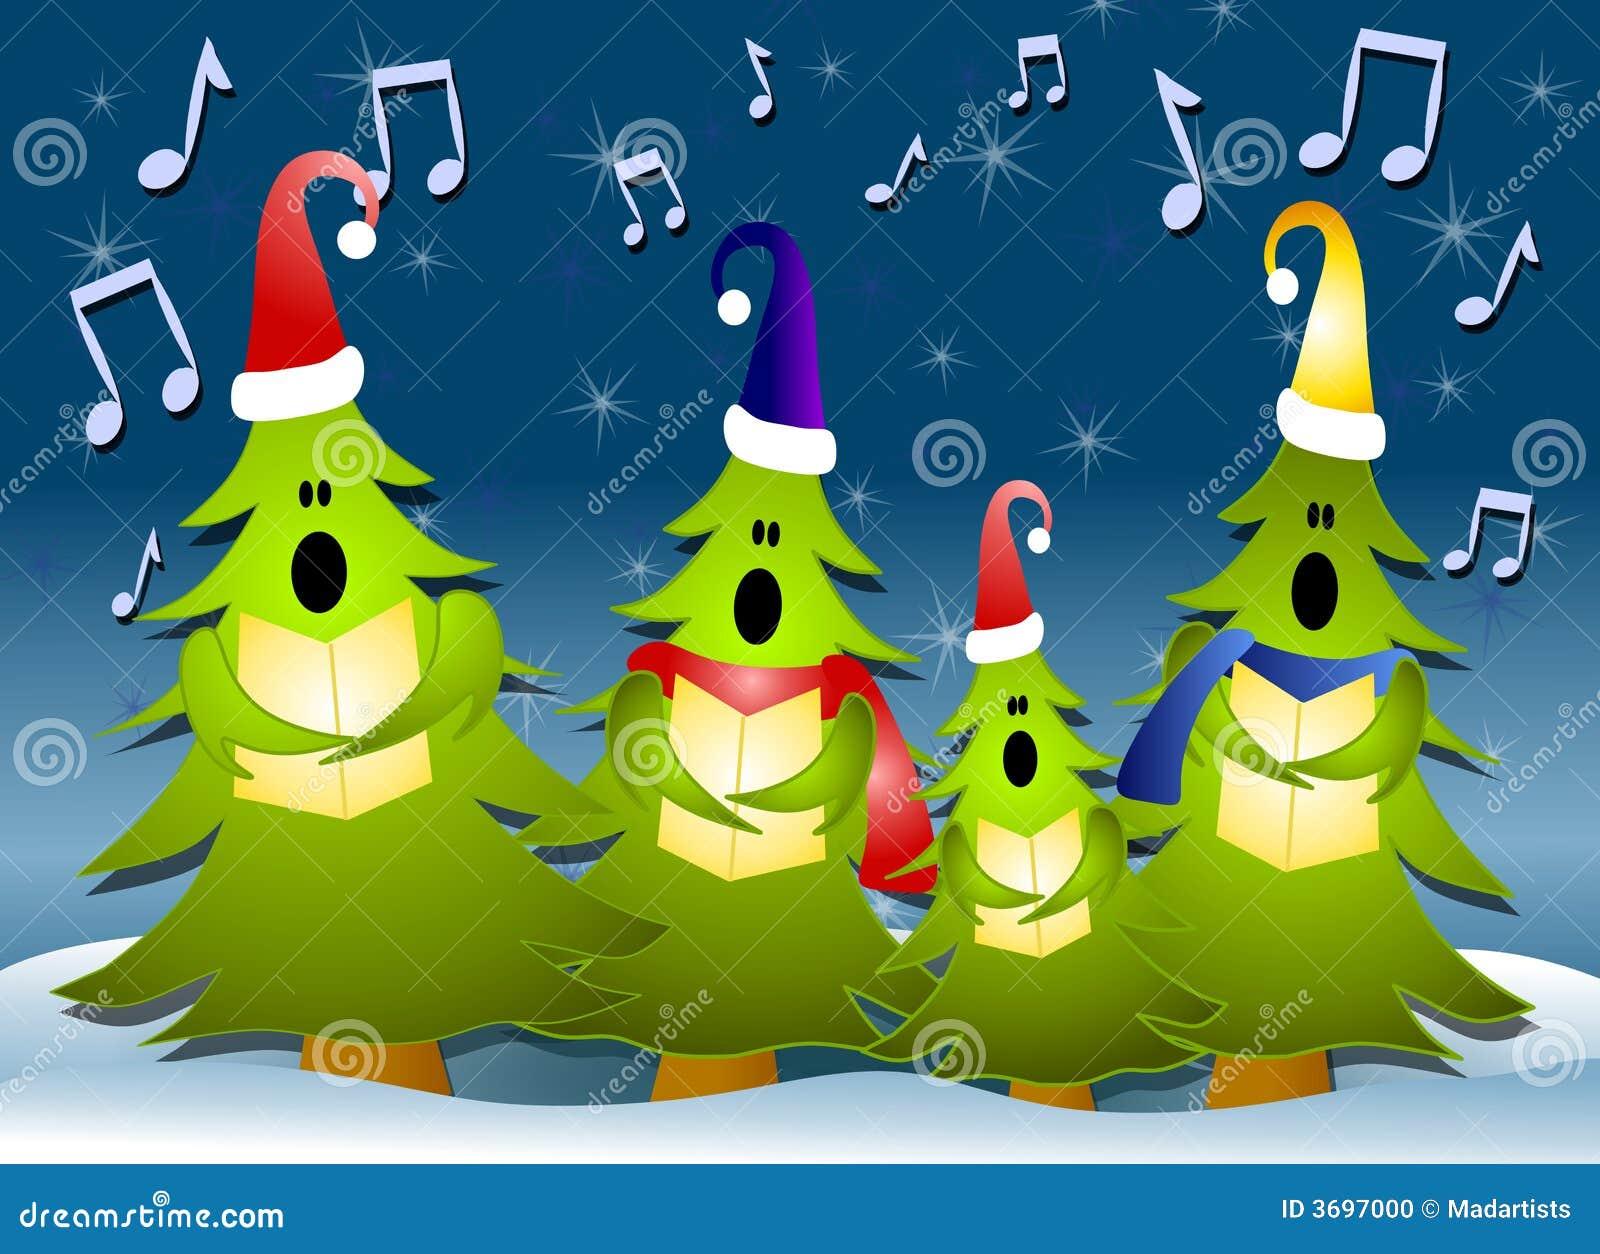 free clipart christmas carolers - photo #39